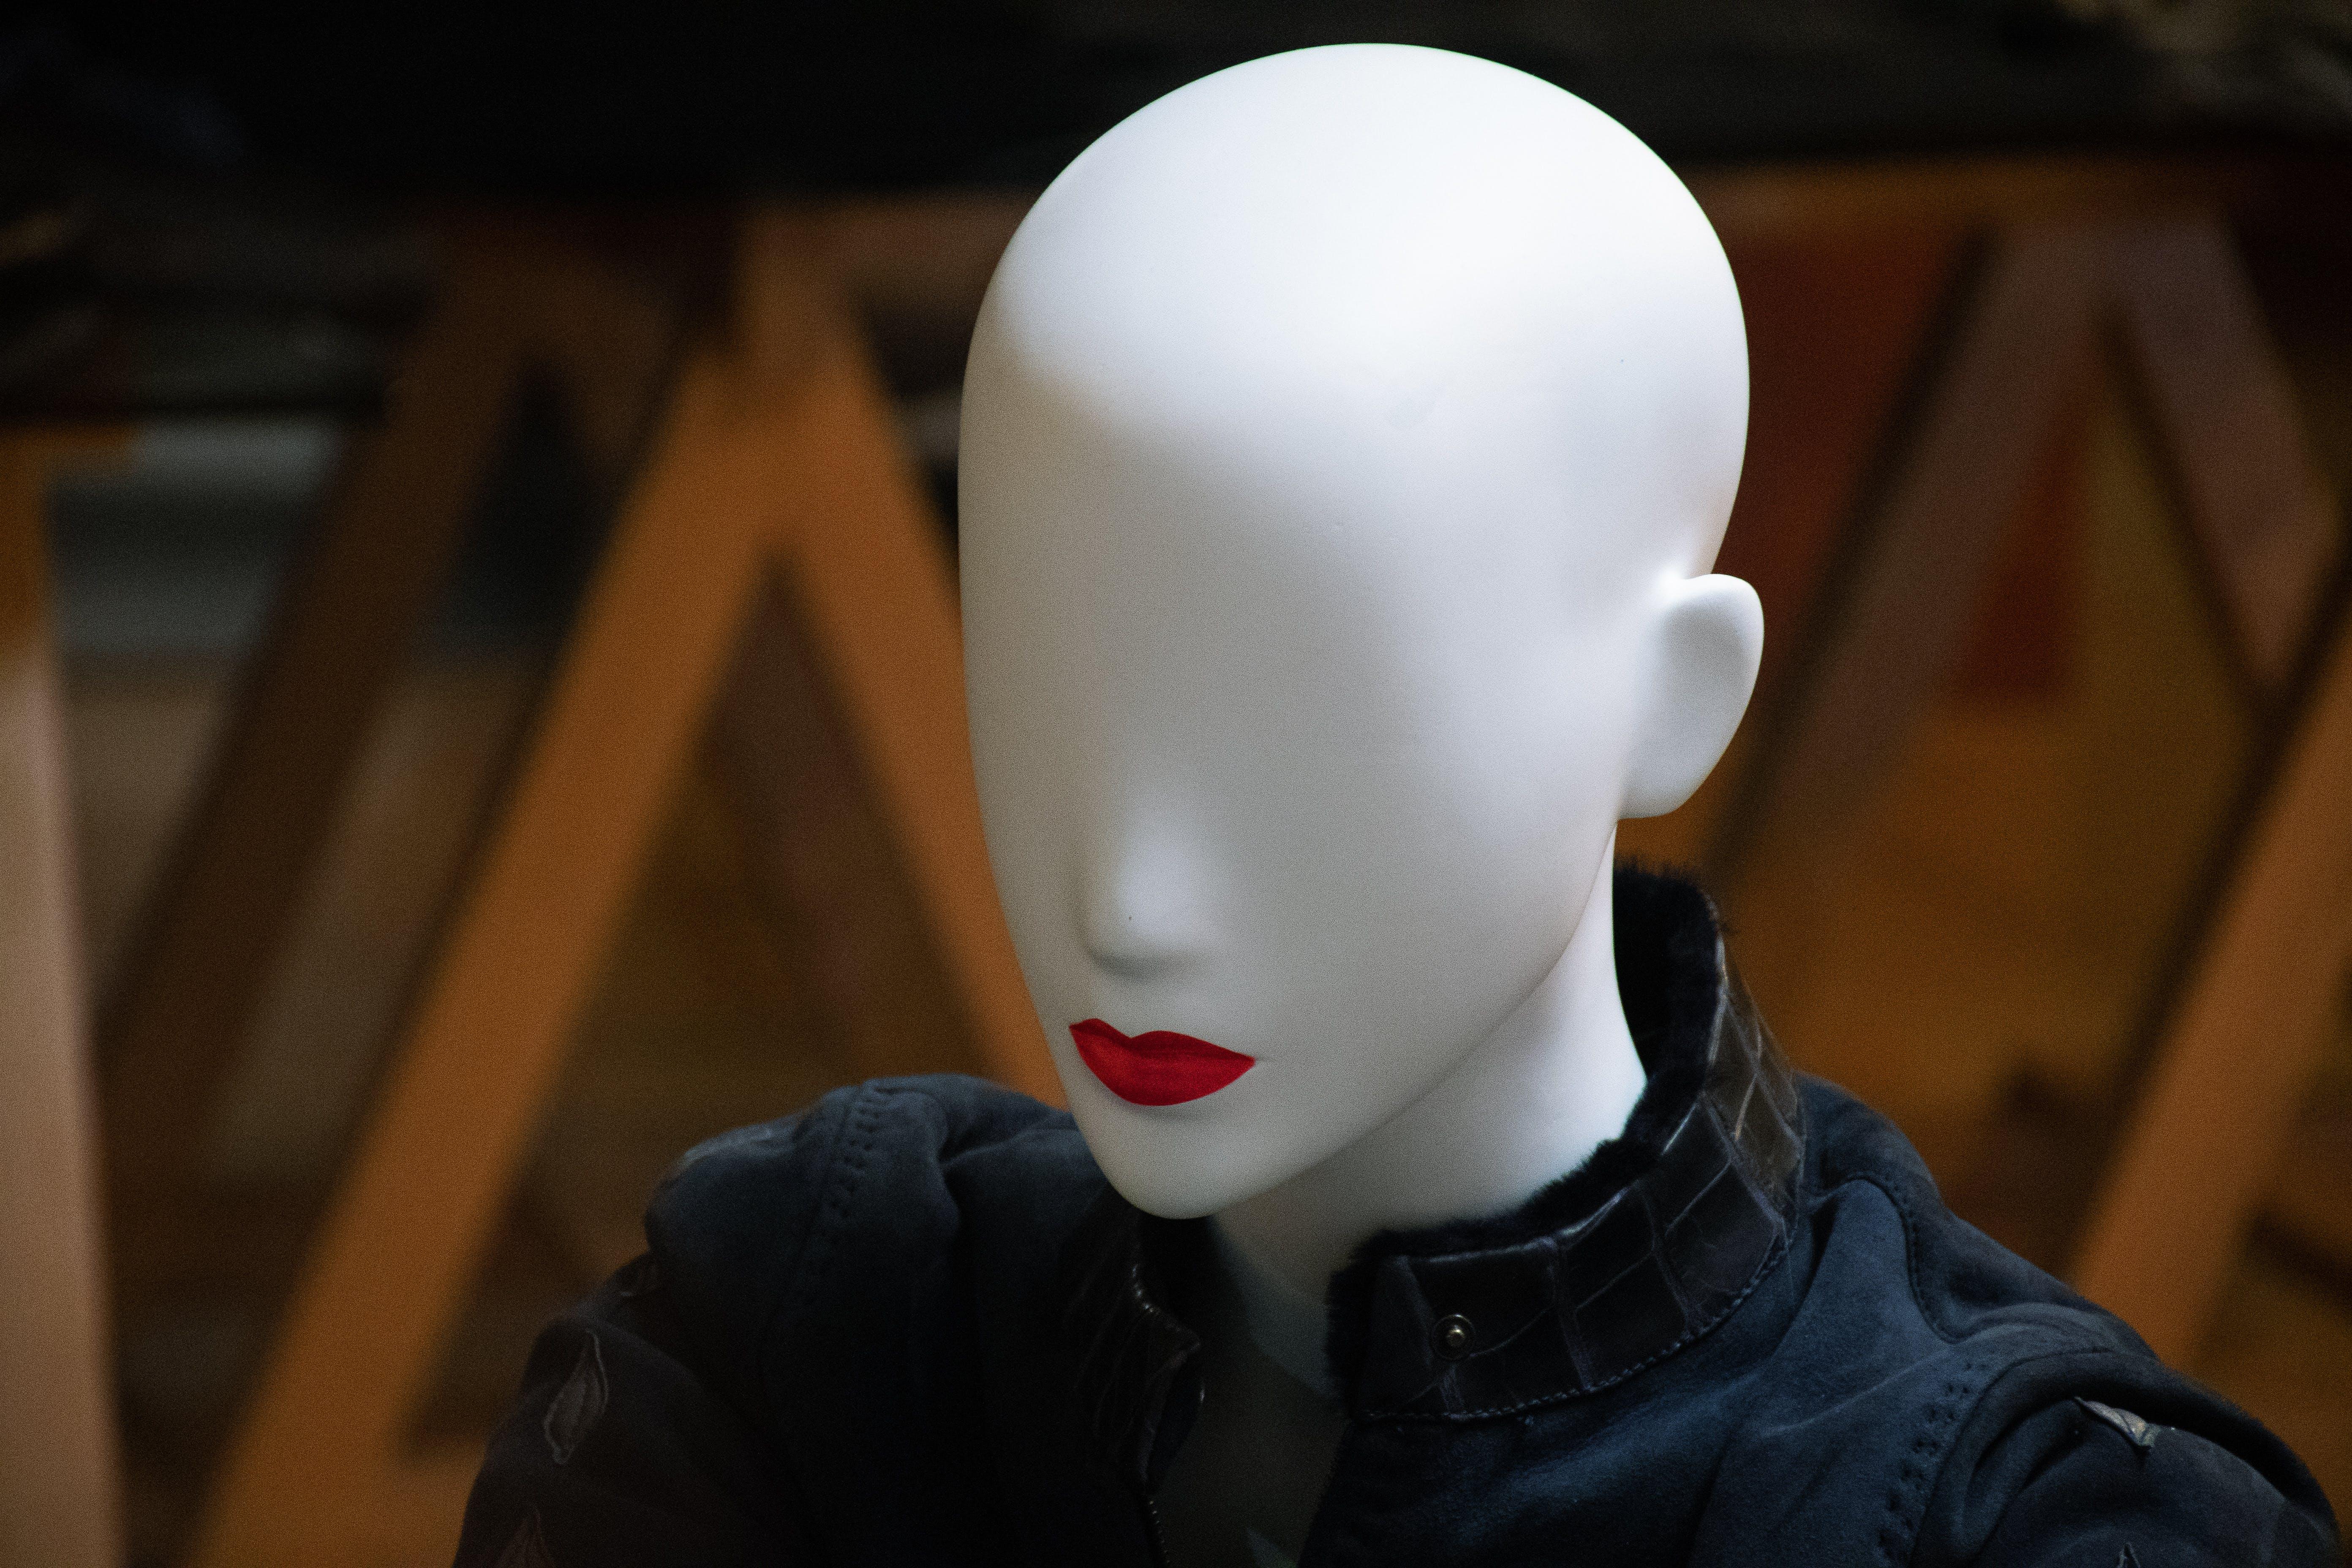 Female Mannequin Wearing Black Jacket